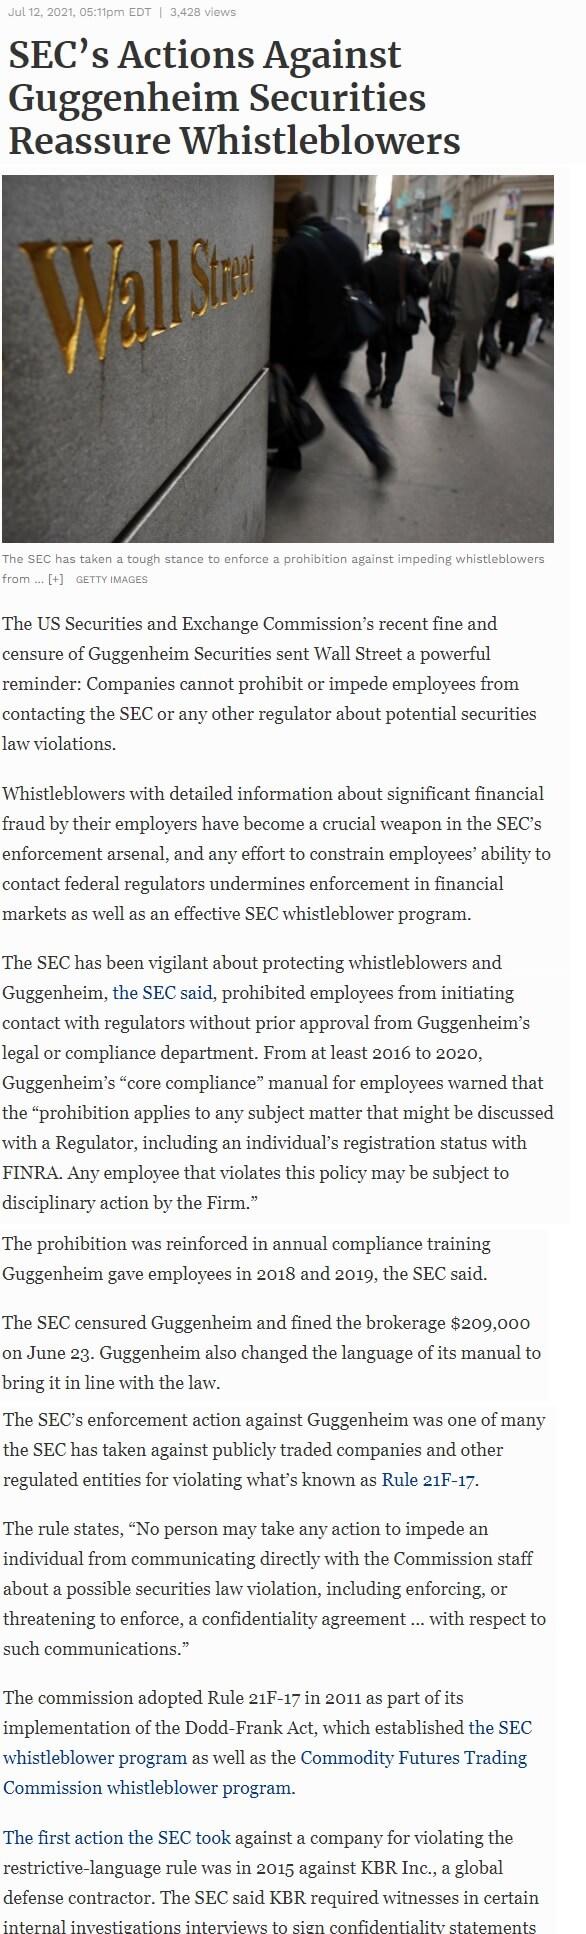 SEC-s-Actions-Against-Guggenheim-Securities-Reassure-Whistleblowers